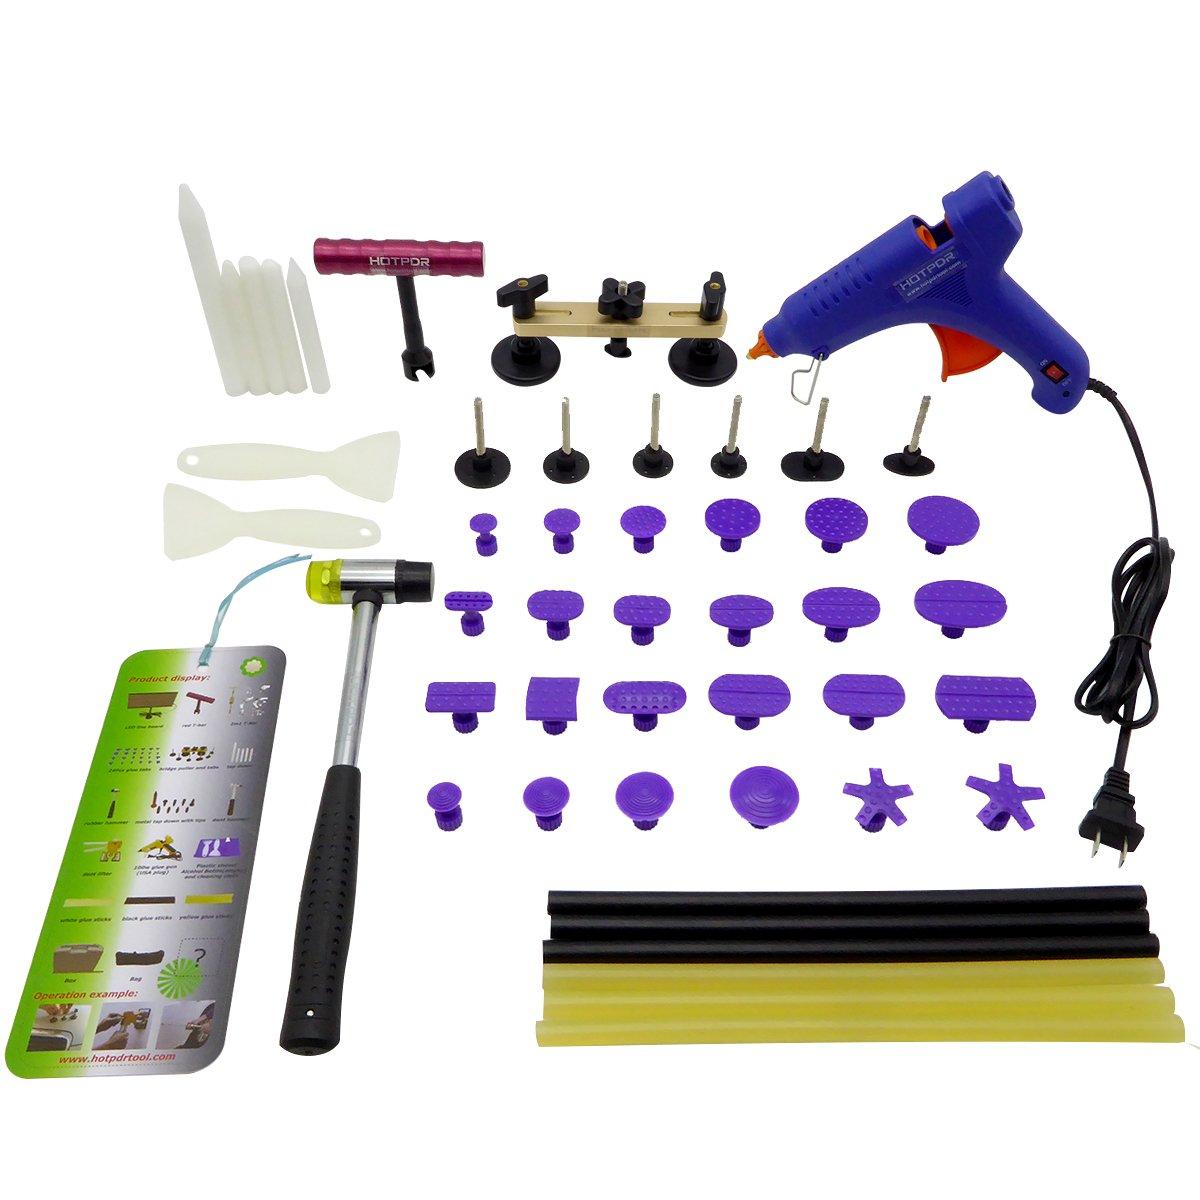 PIDINGER 19PCS Paintless Dent Removal Tools Aluminum Auto Body Dent Repair Puller and Nylon Tab Set